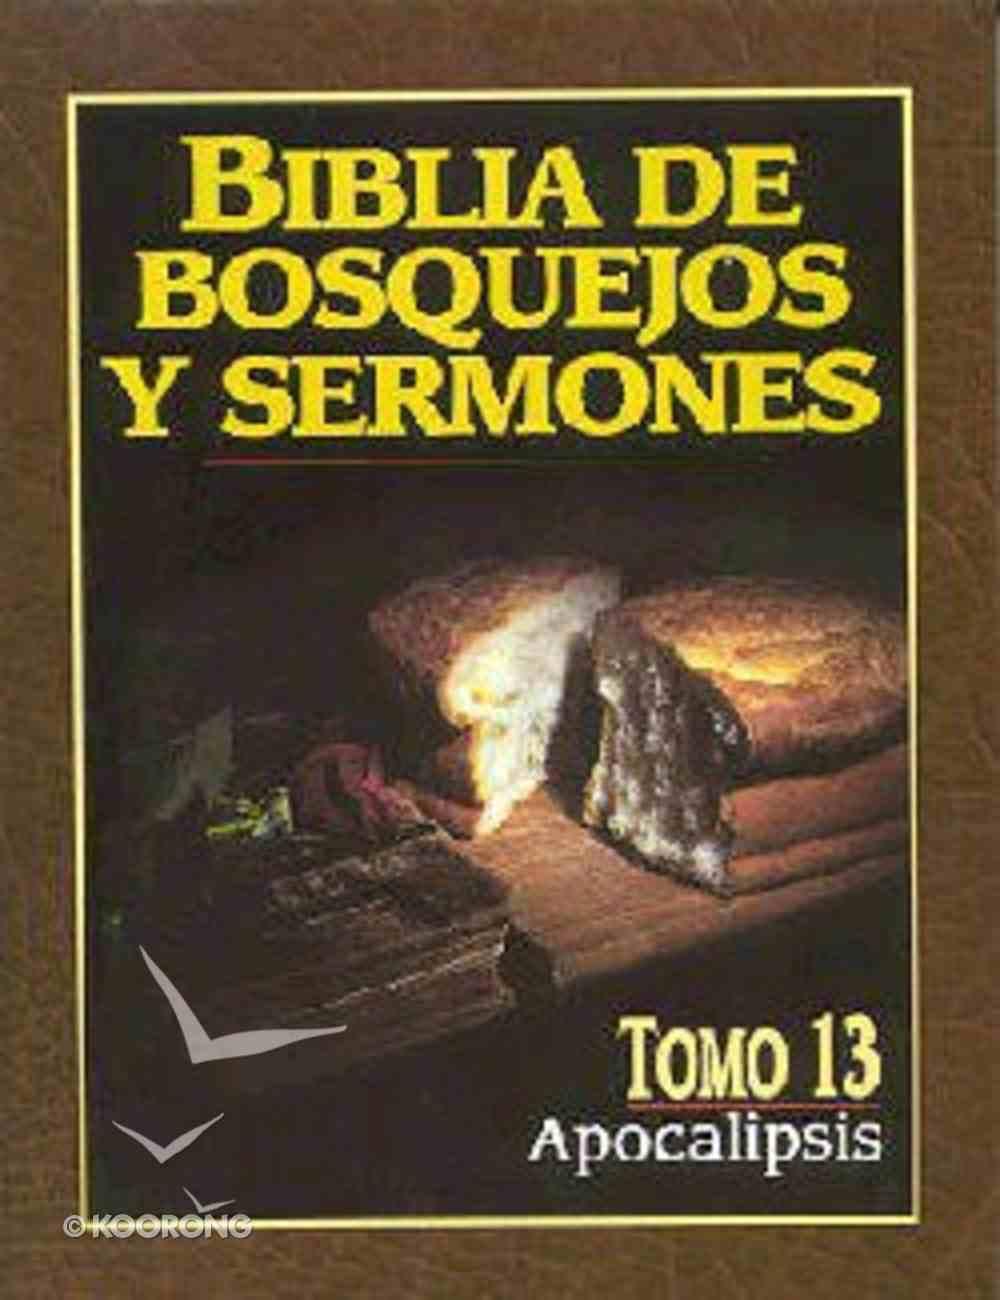 Biblia De Bosquejos Y Sermones #13: Apocalipsis (Posb #13: Revelation) (#13 in Preacher's Outline & Sermon Bible Series) Paperback